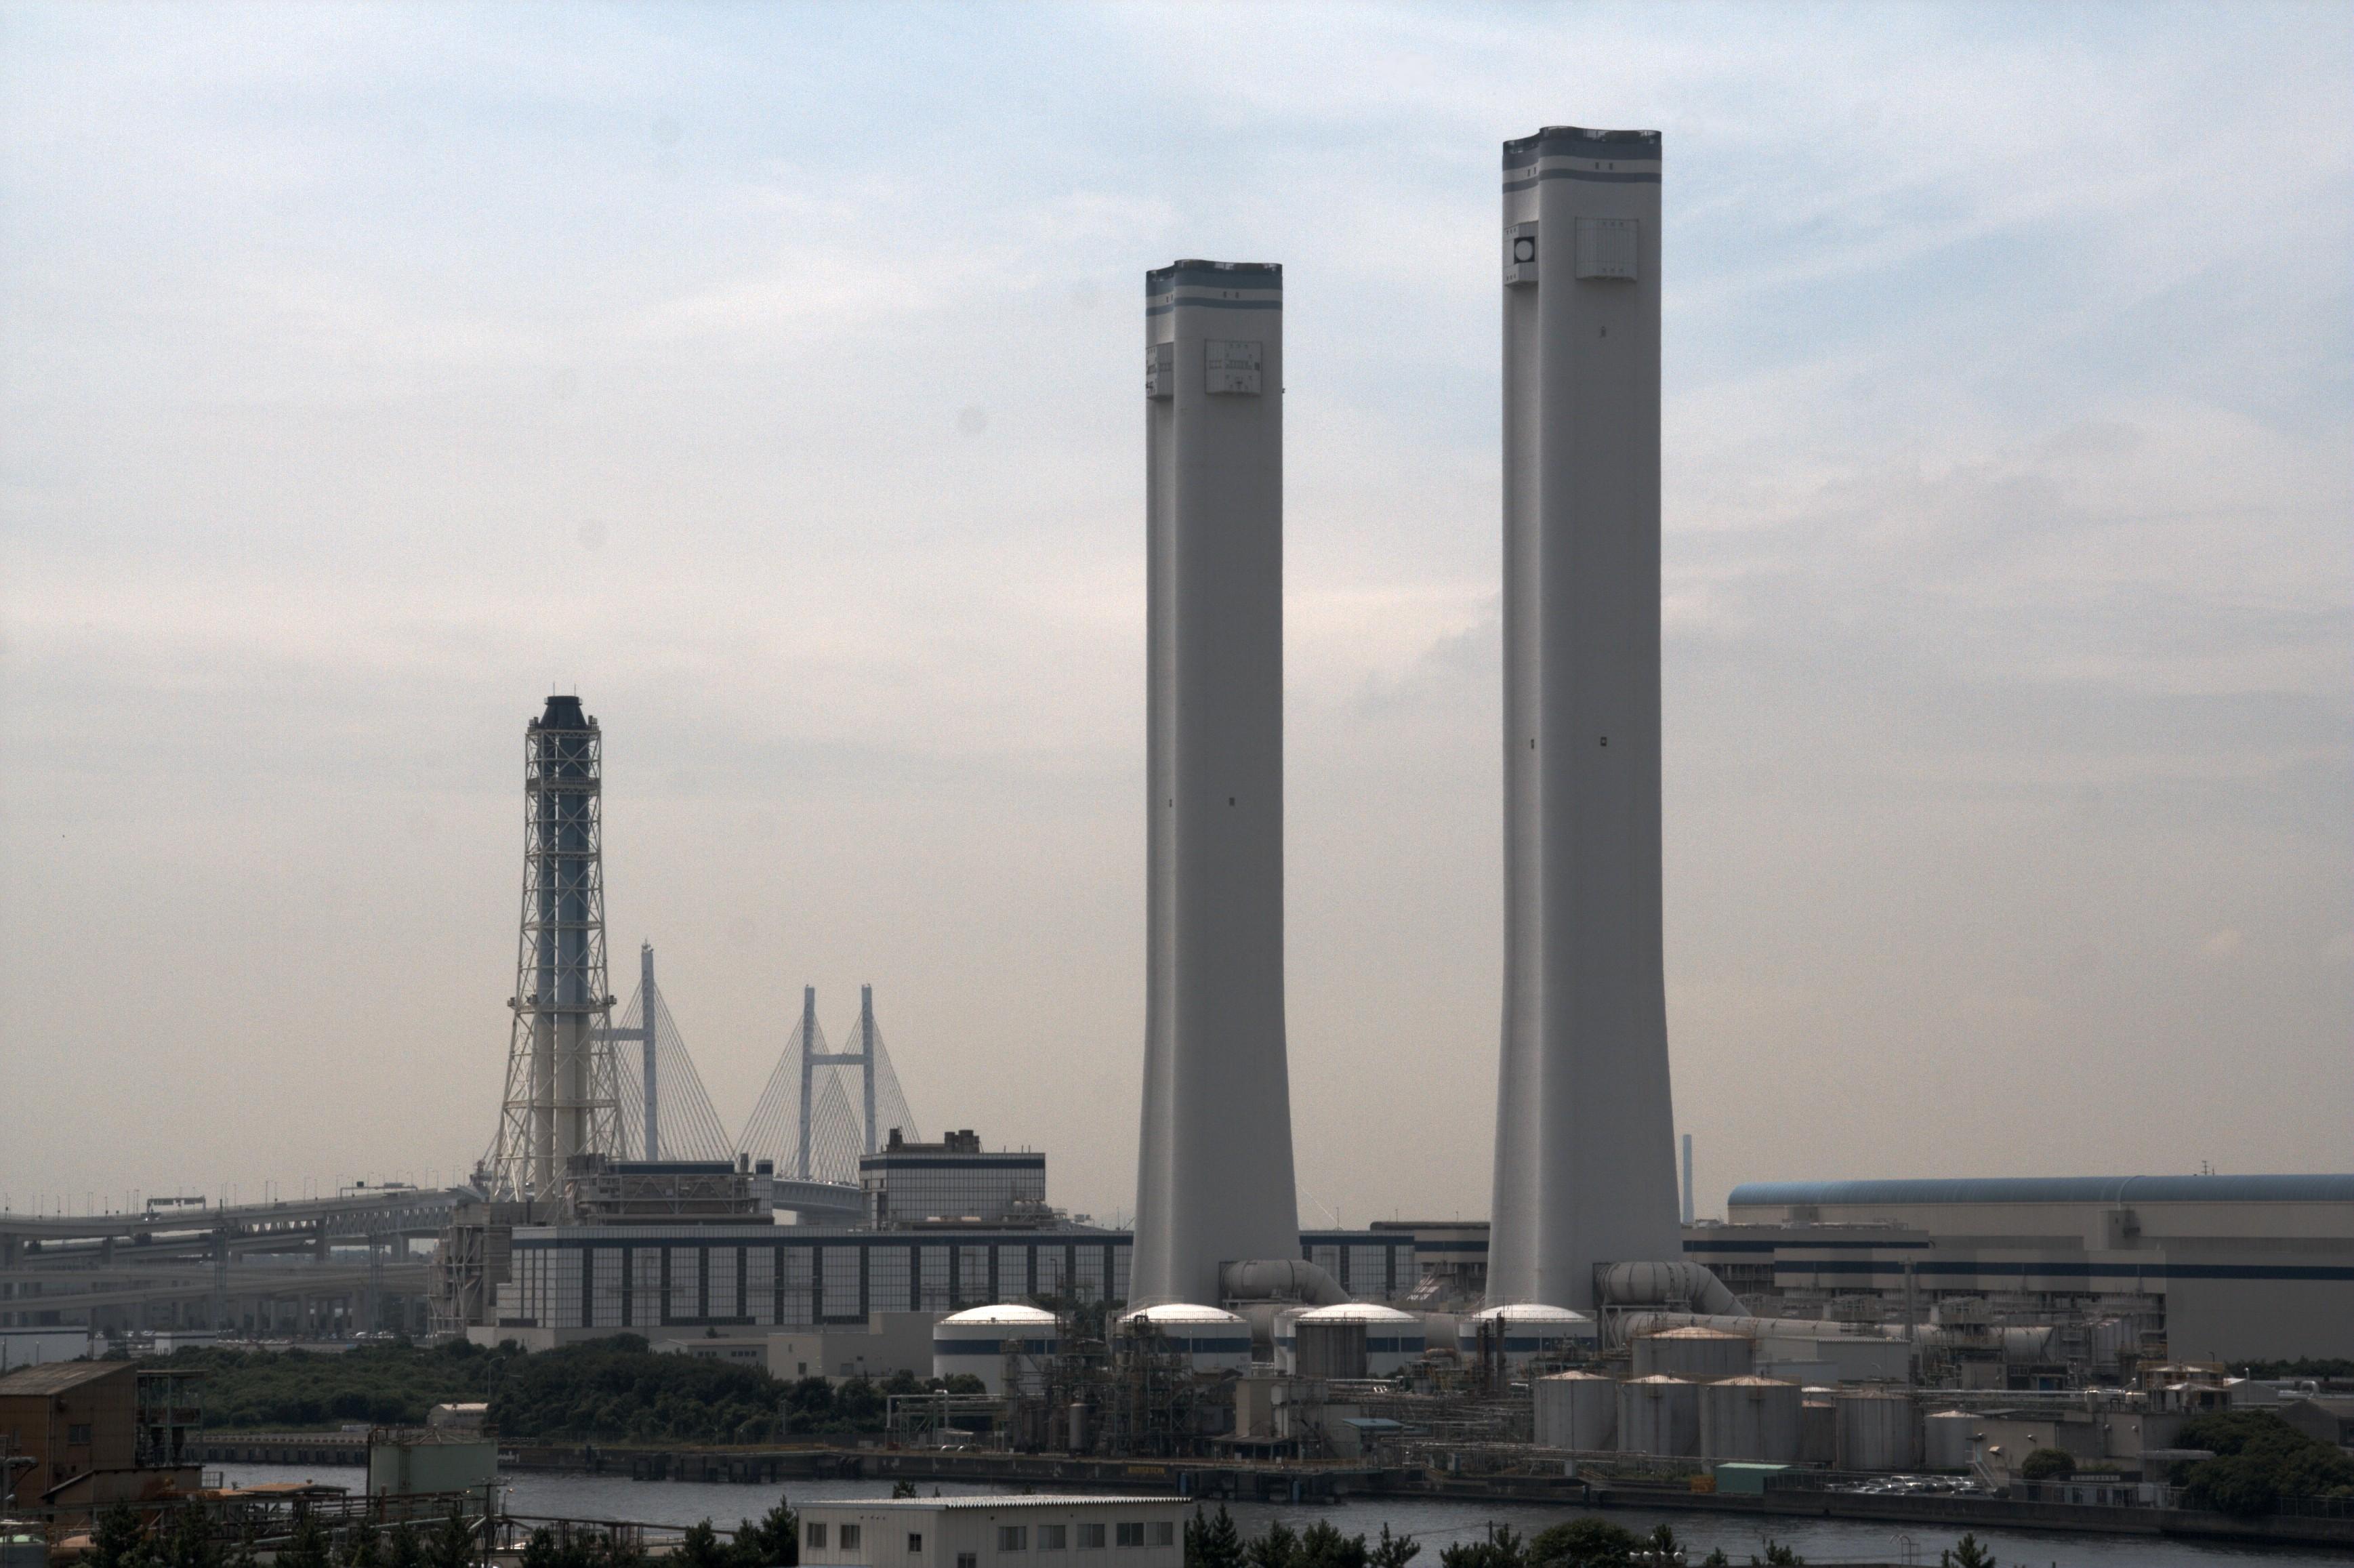 Twin Tower TEPCO Yokohama power station02.jpg